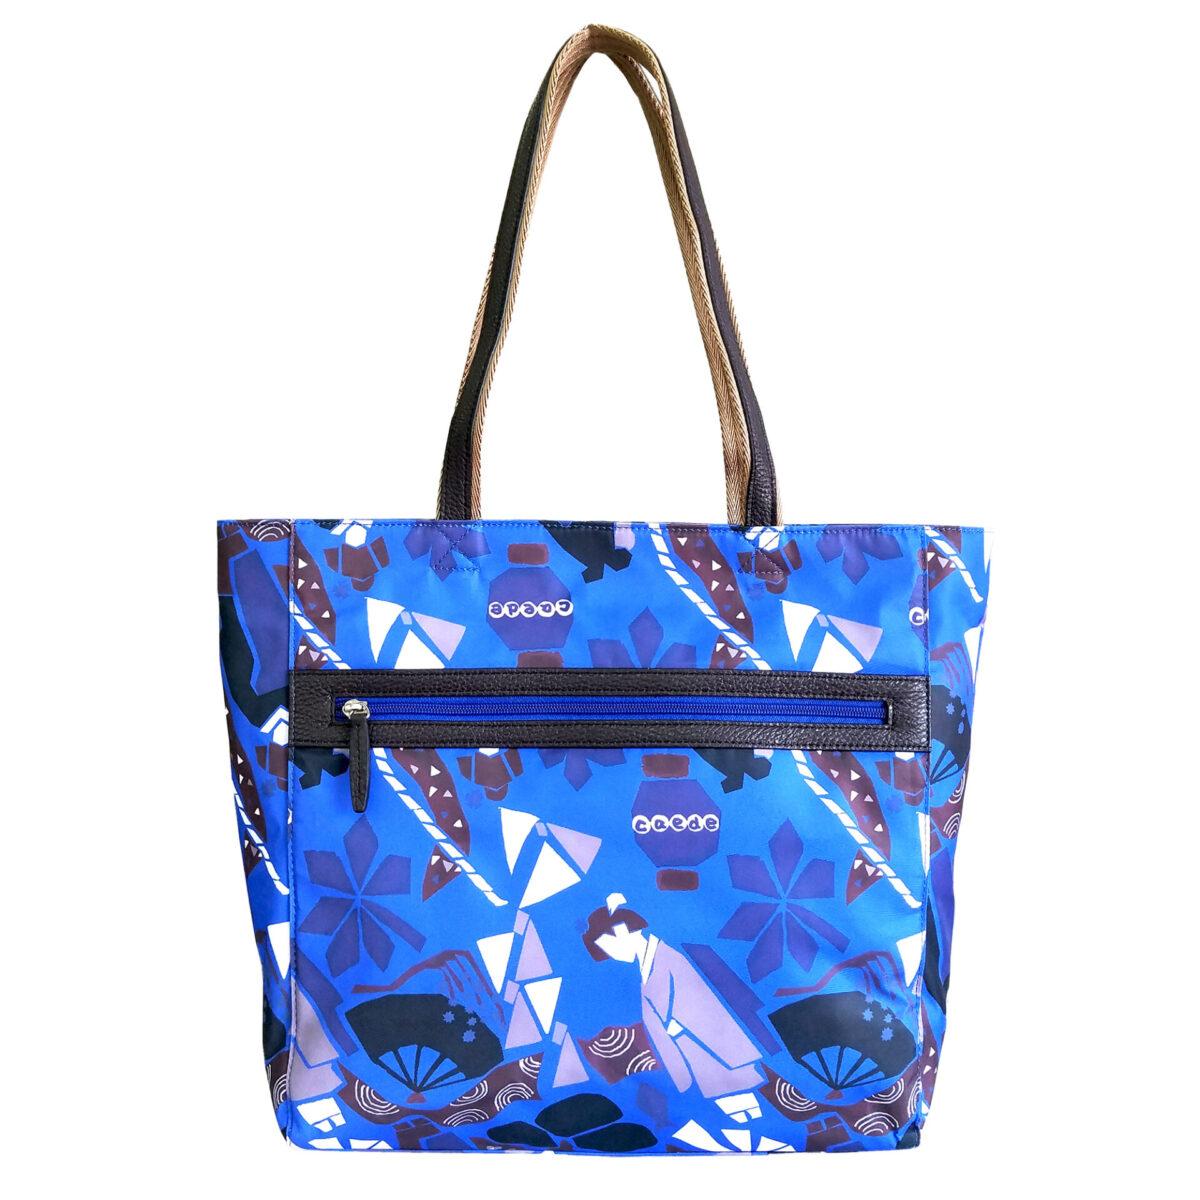 Maiko Puzzle Linate Tote blue